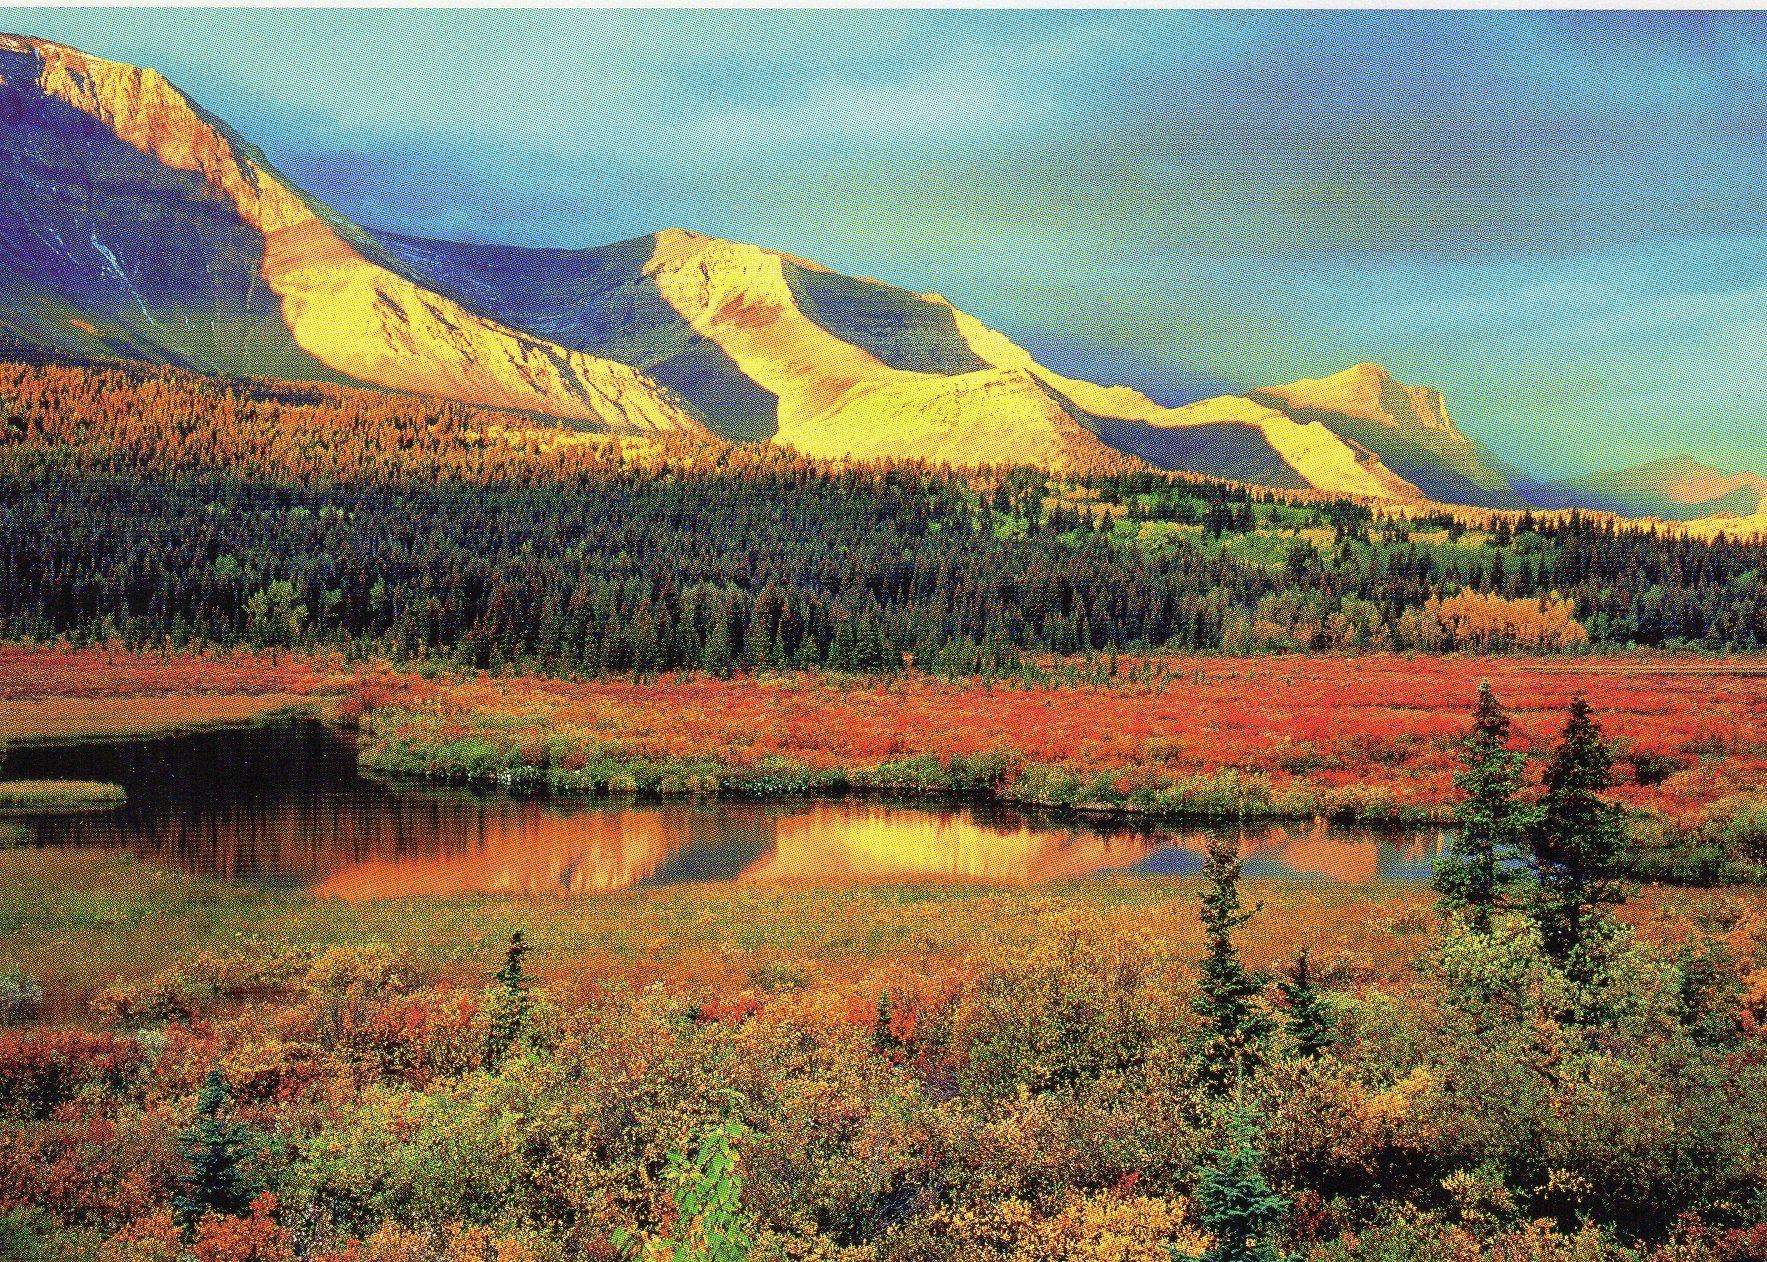 Crooked River, Waterton Lakes National Park, Alberta.  Photo credit: Tim Fitzharris